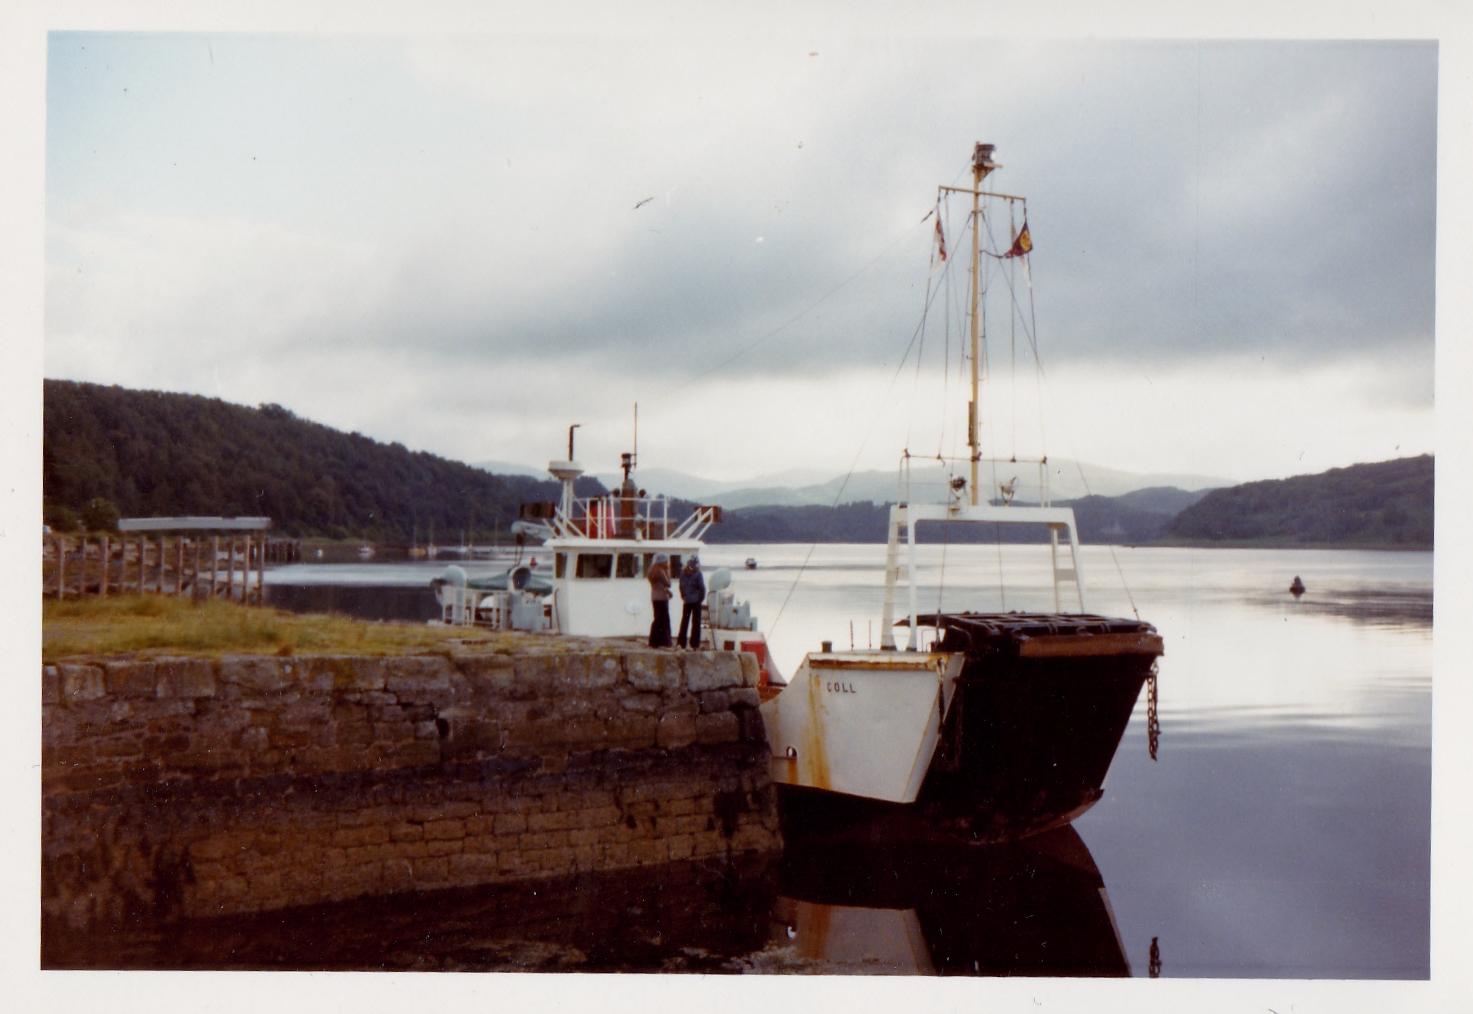 Coll lying at Lochaline (Jim Aikman Smith)